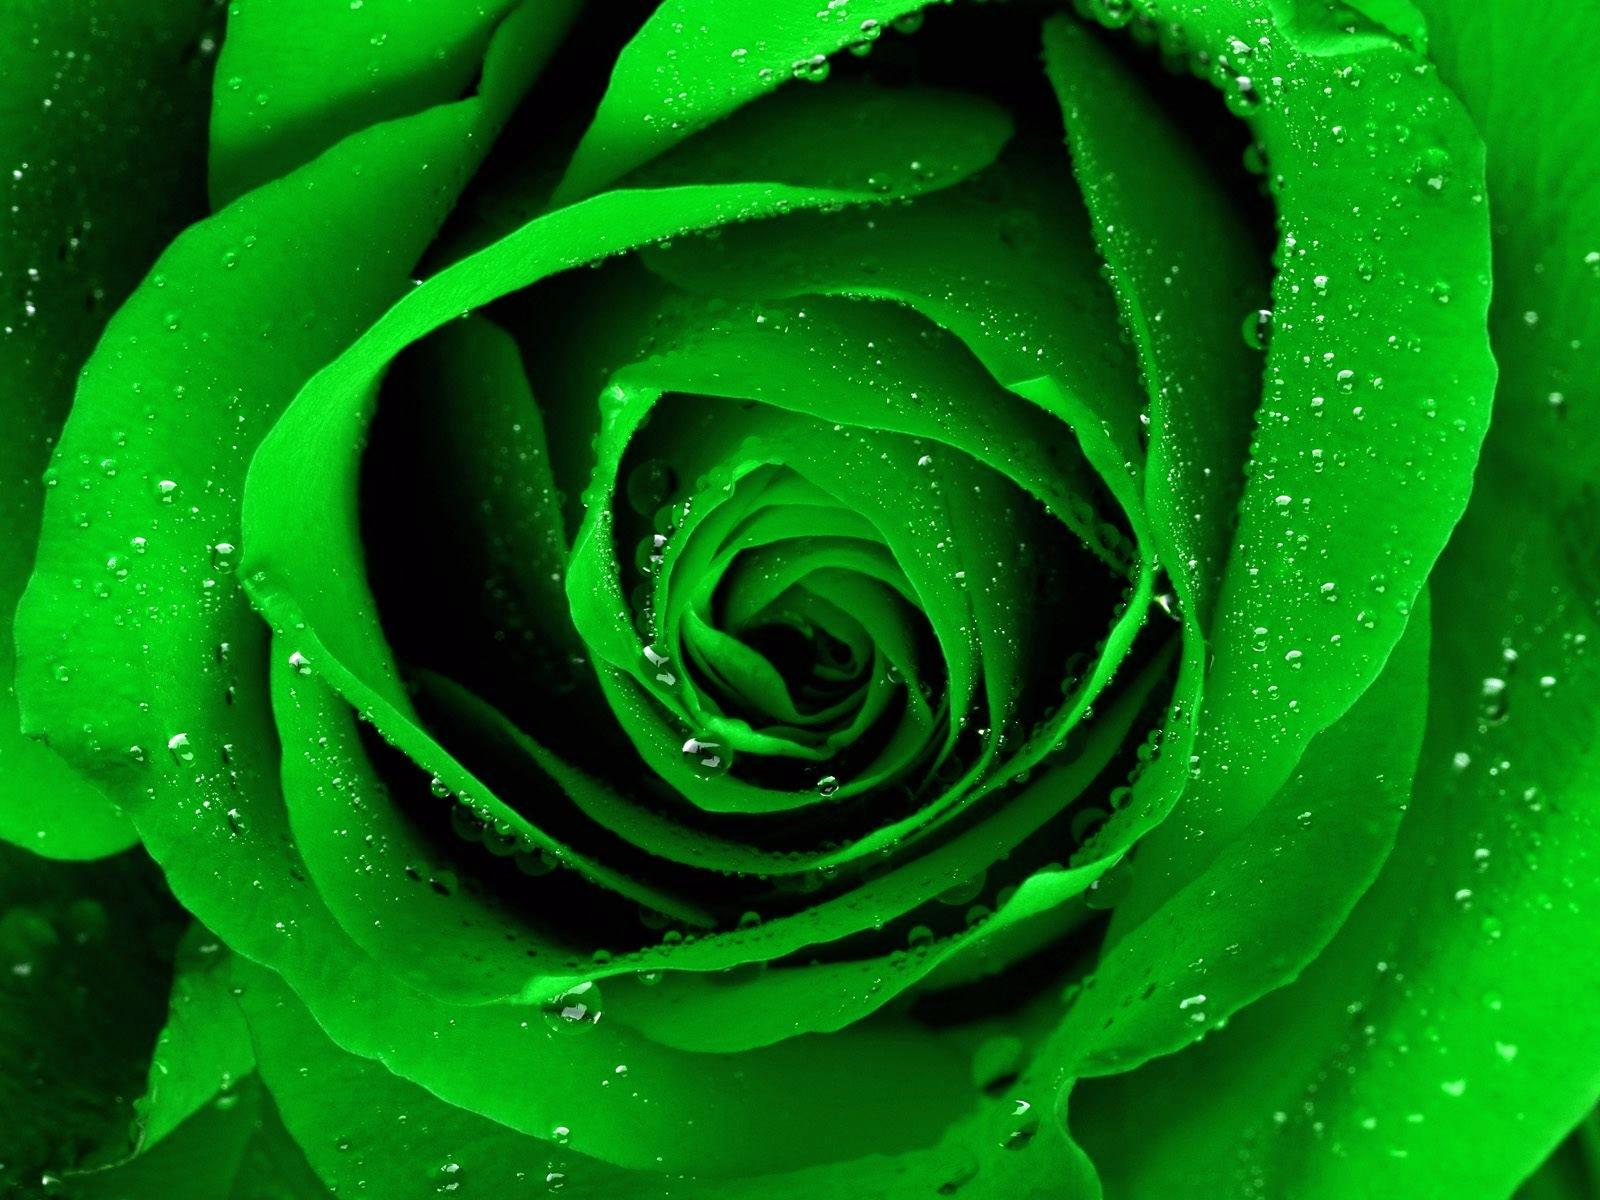 beautiful rose flower wallpaper backgrounds desktop background